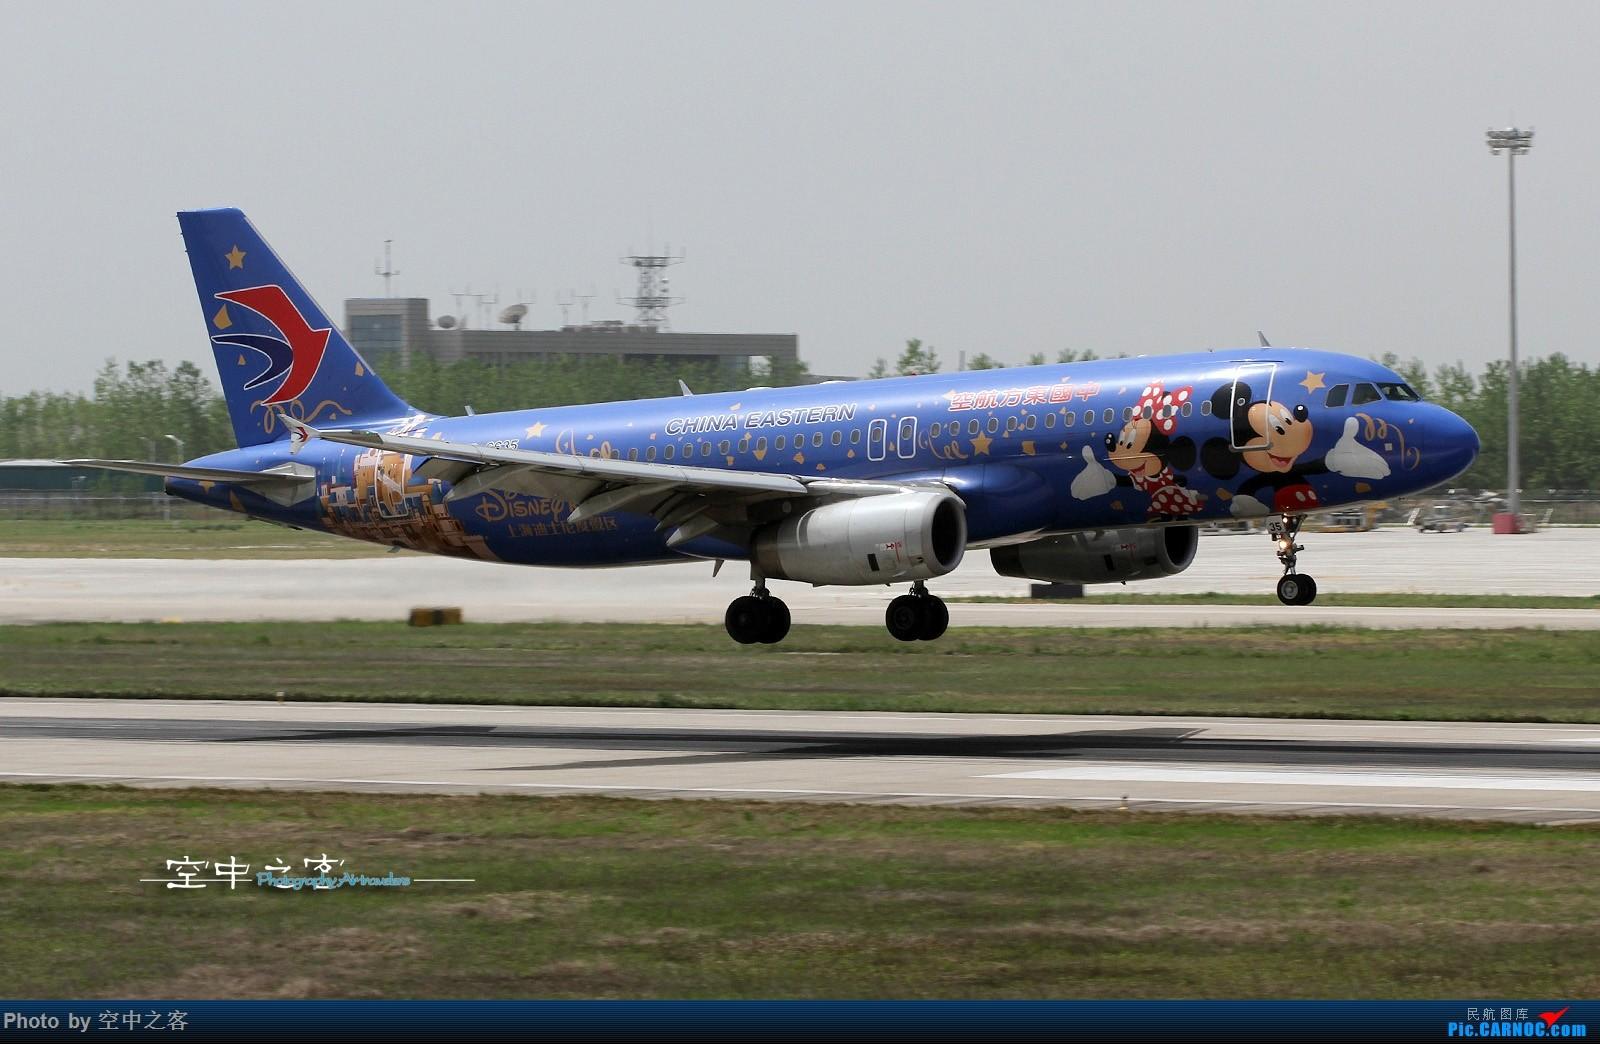 Re:[合肥飞友会·霸都打机队]空中之客出品 大佬们都回来了 我还在新机场看小小米老鼠迪斯尼装飞机 AIRBUS A320-200 B-6635 合肥新桥国际机场